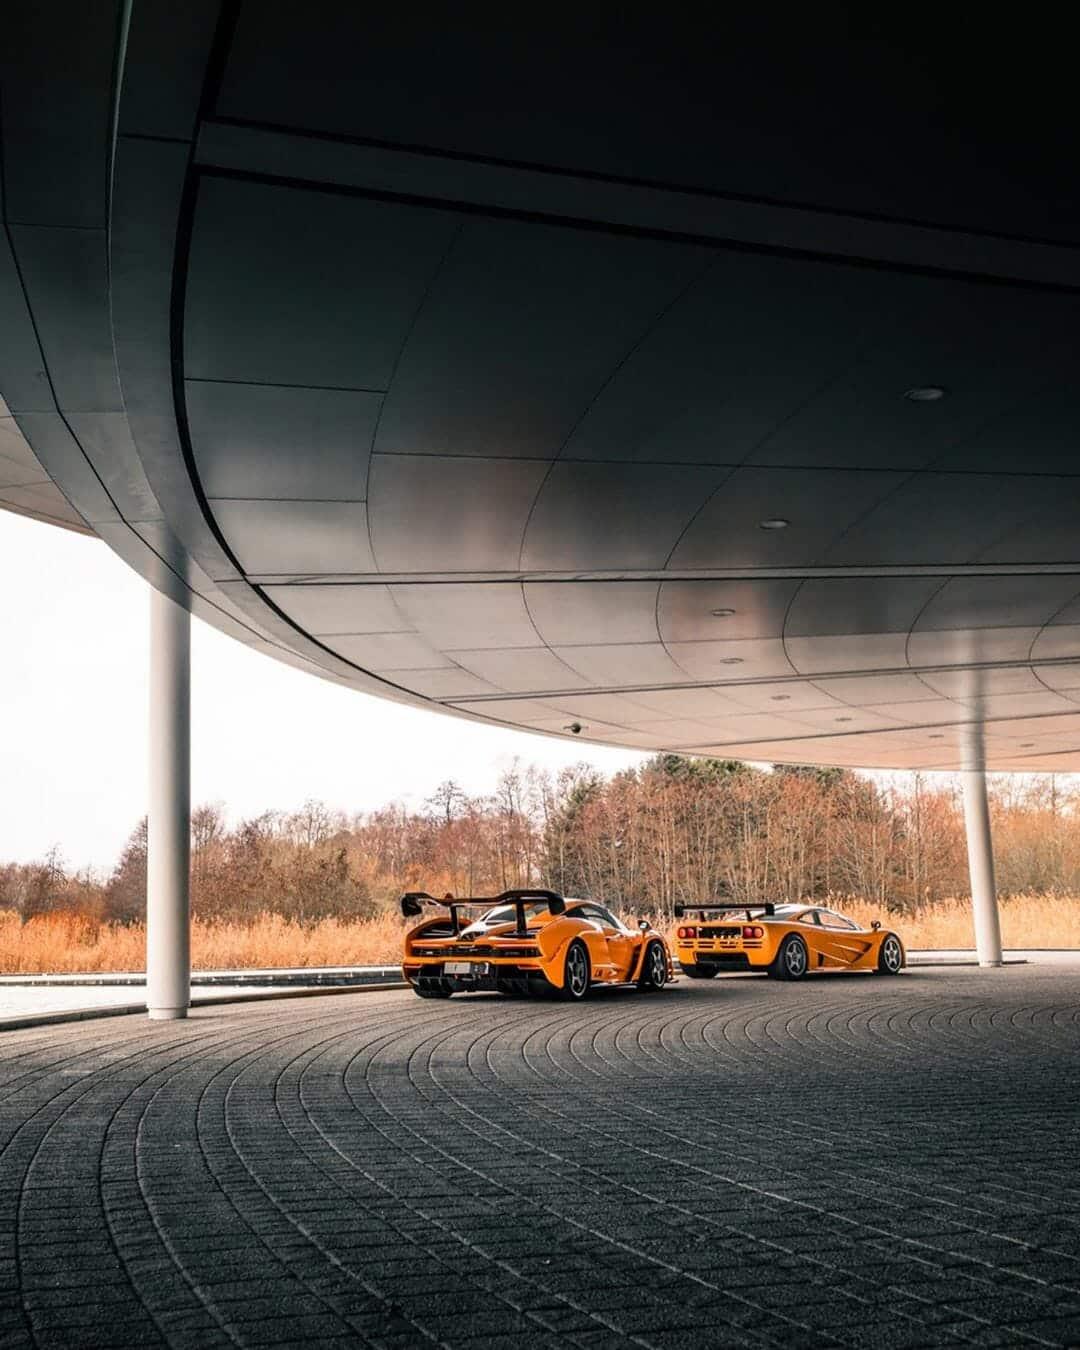 McLaren F1 LM & McLaren Senna - Image 11